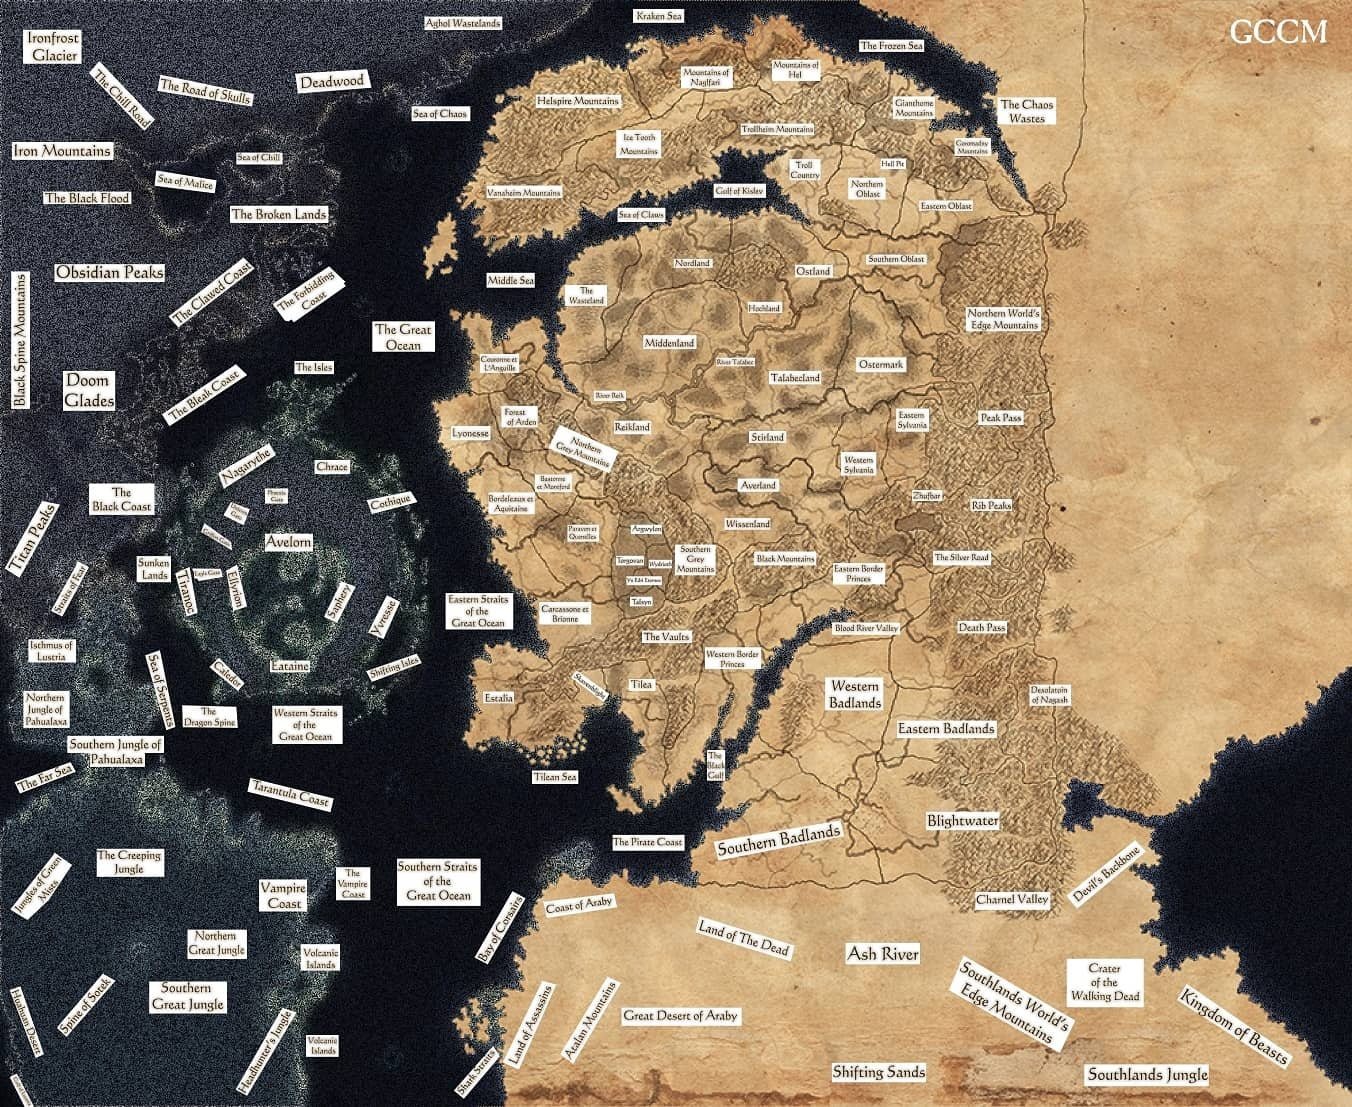 Total War: Warhammer 2; Mortal Empires, Map